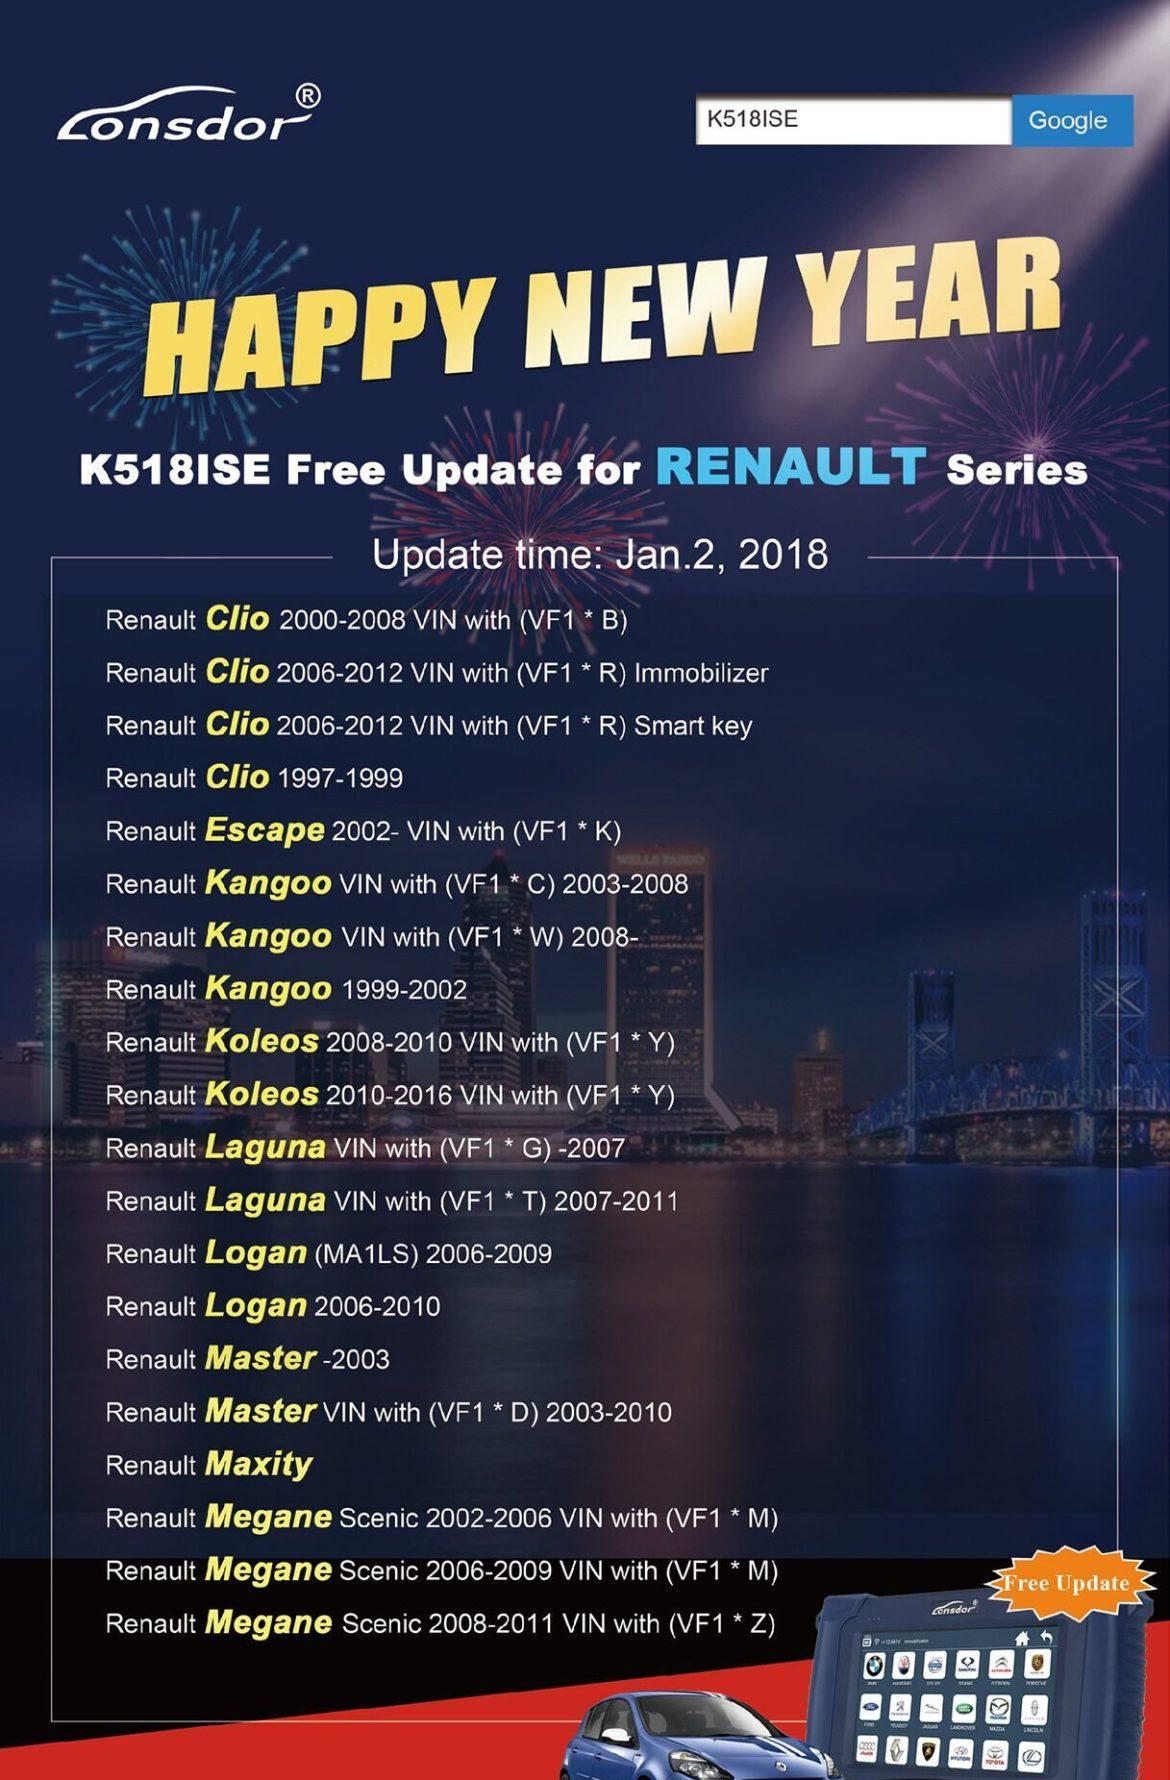 losndor-update-renault